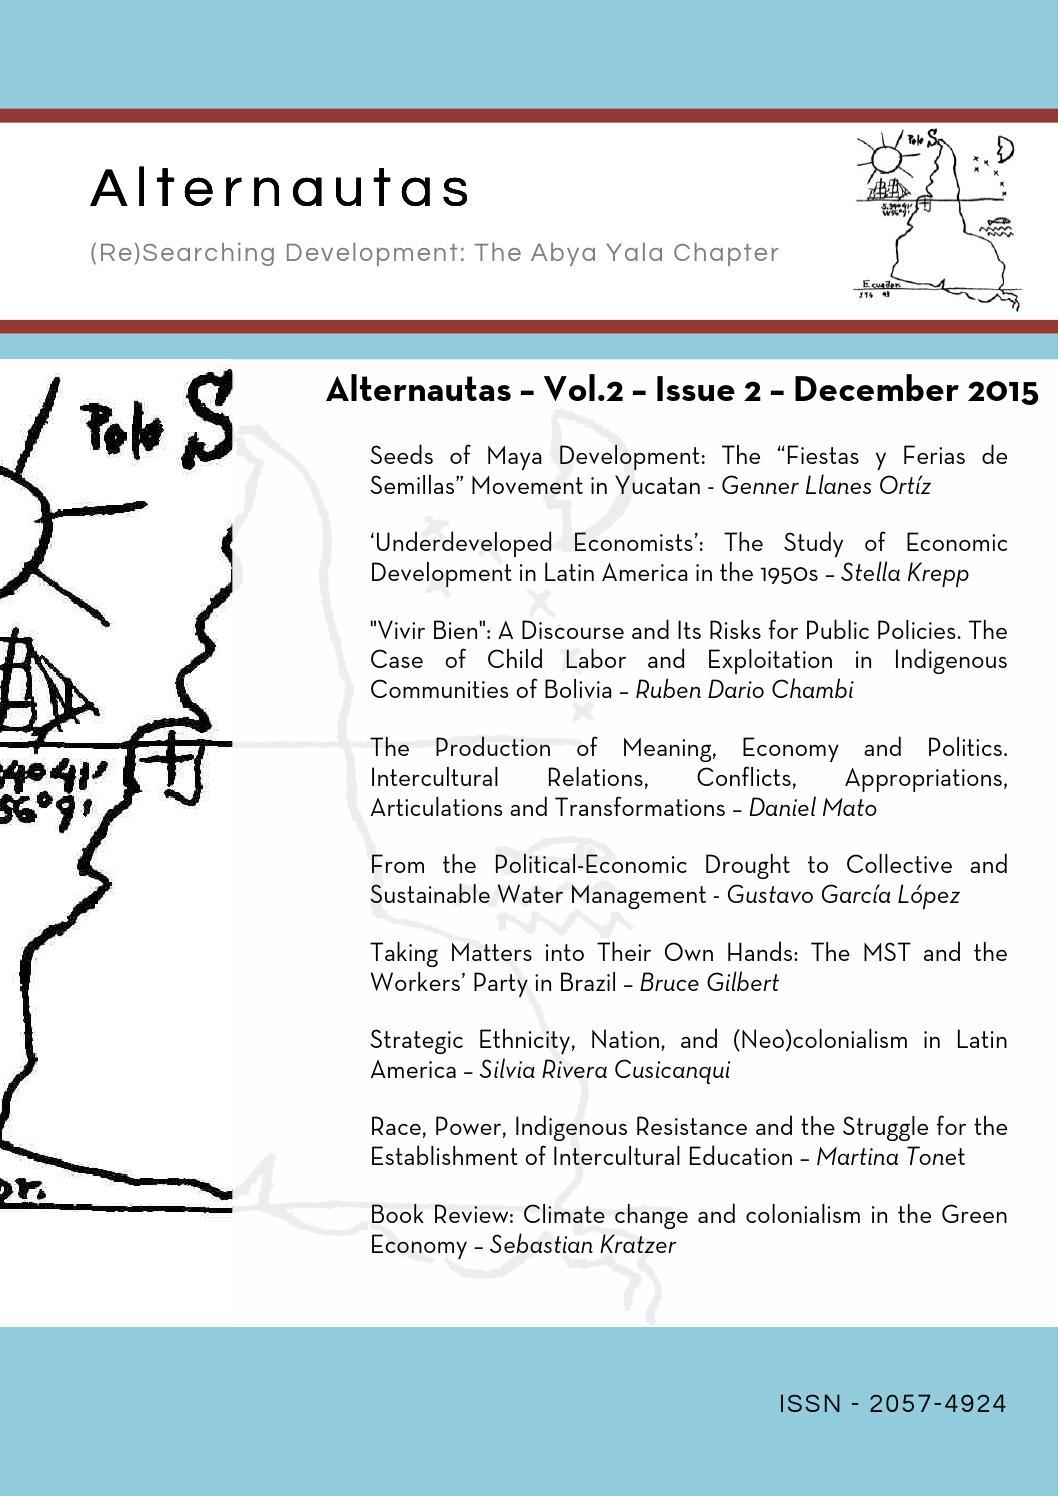 Alternautas Vol 2 Issue 2 - December 2015 by Alternautas